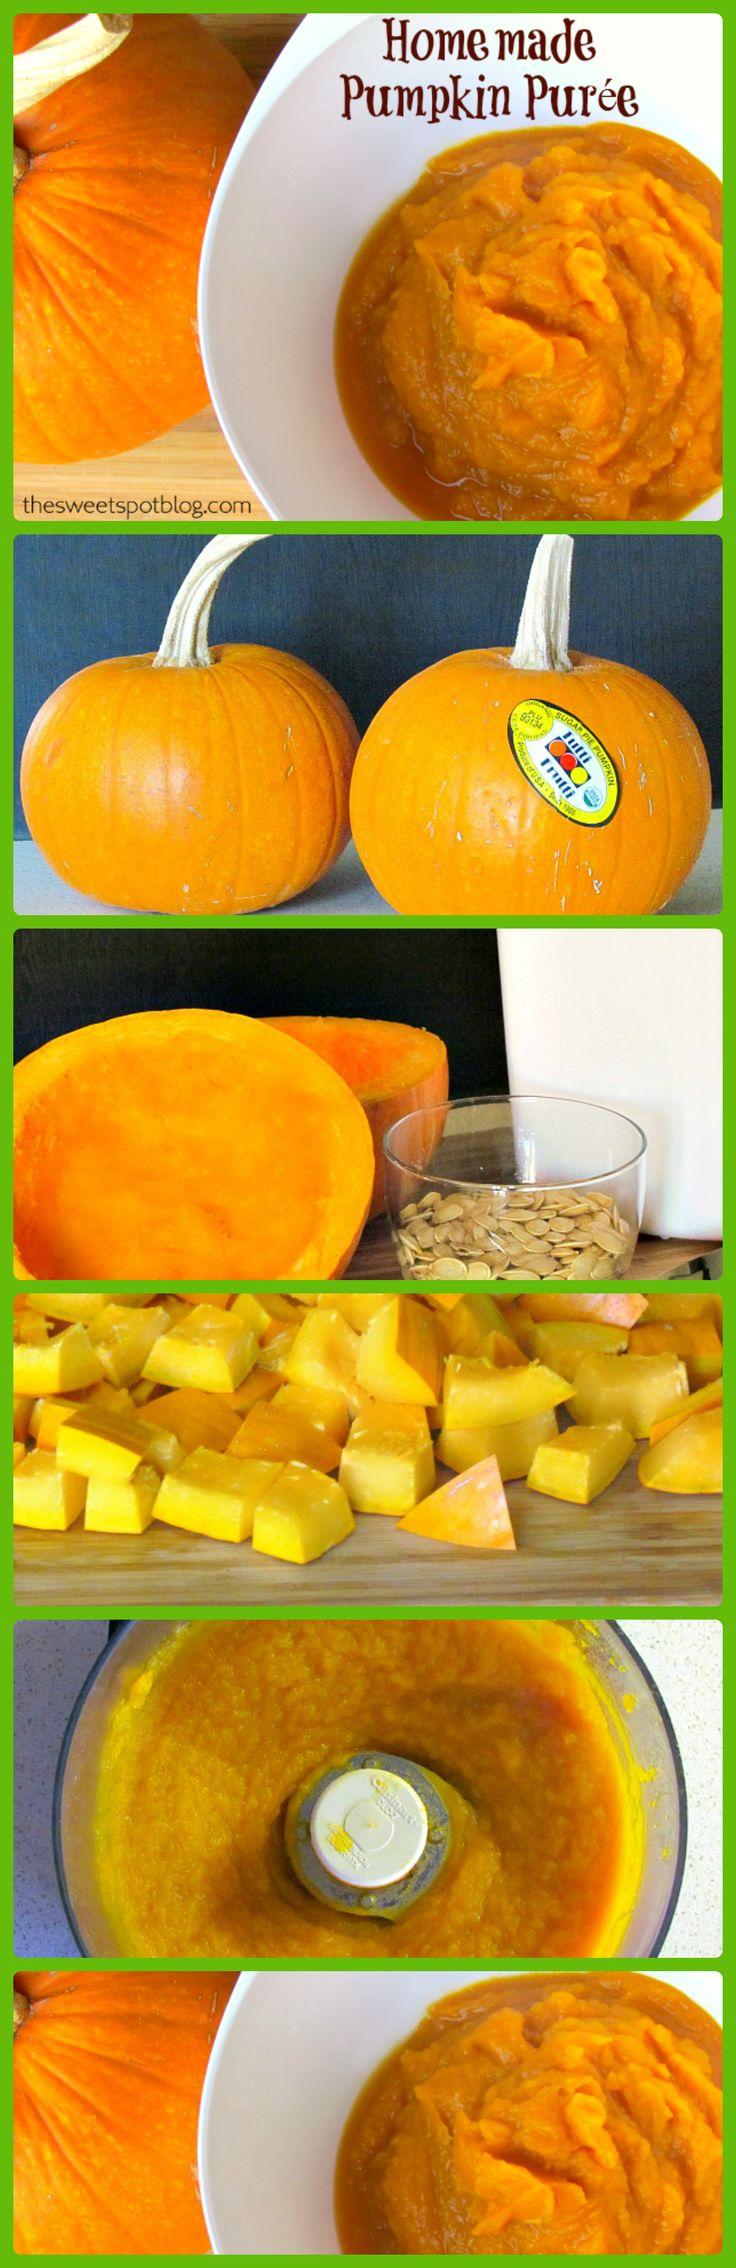 How to Make Homemade Pumpkin Puree to Kick-up Your Pumpkin Recipes! #halloween #thanksgiving #food